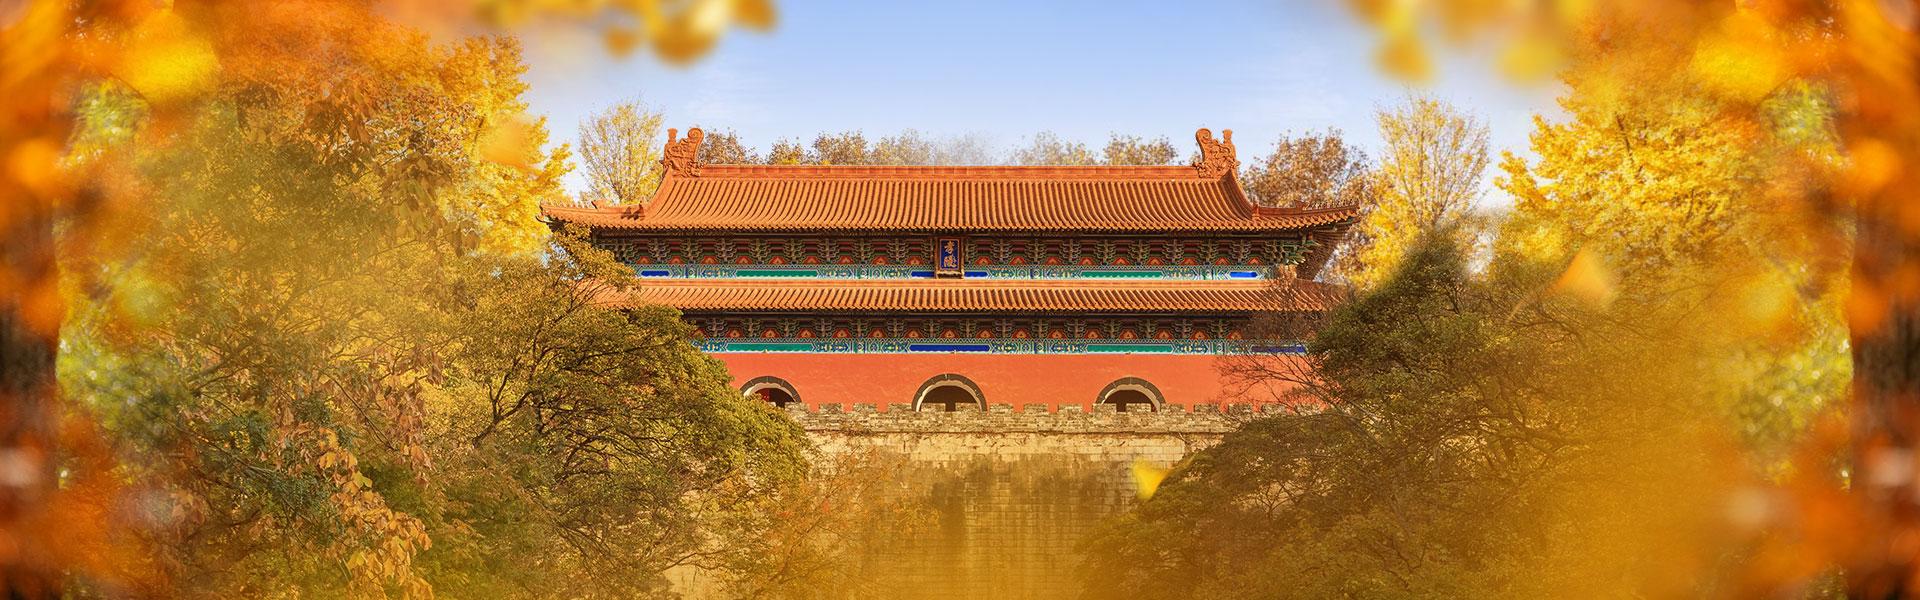 https://www.gonanjingchina.com/sites/default/files/revslider/image/ming_tomb.jpg